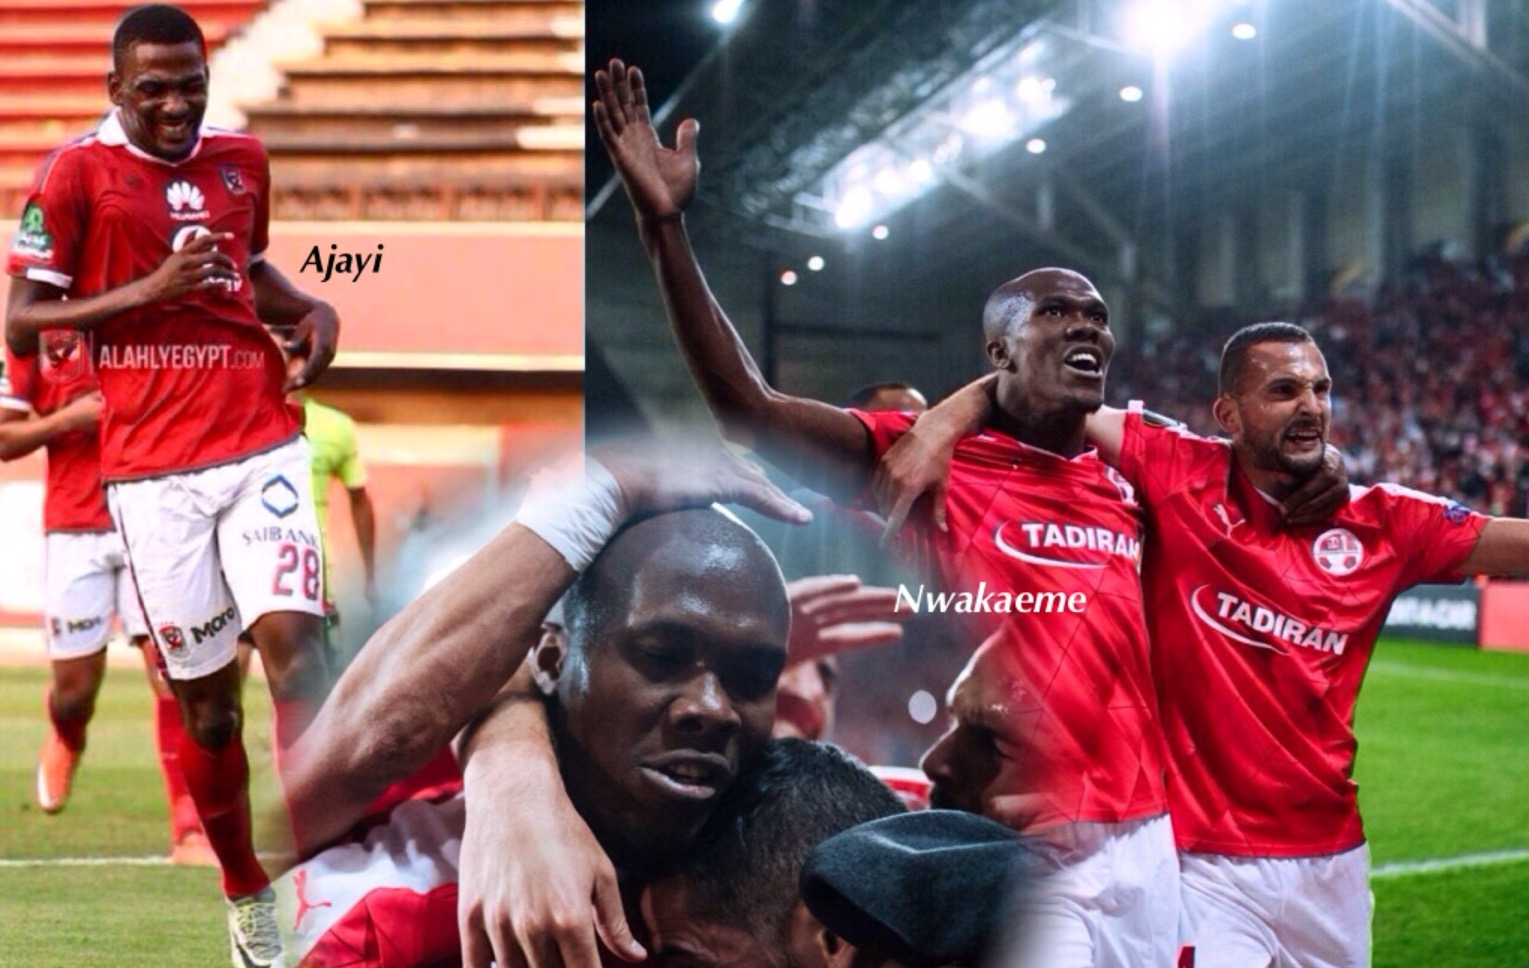 Ajayi, Nwakaeme Score As Al Ahly, Beer Sheva Win;  Ndidi, Oboabona Suffer Defeat